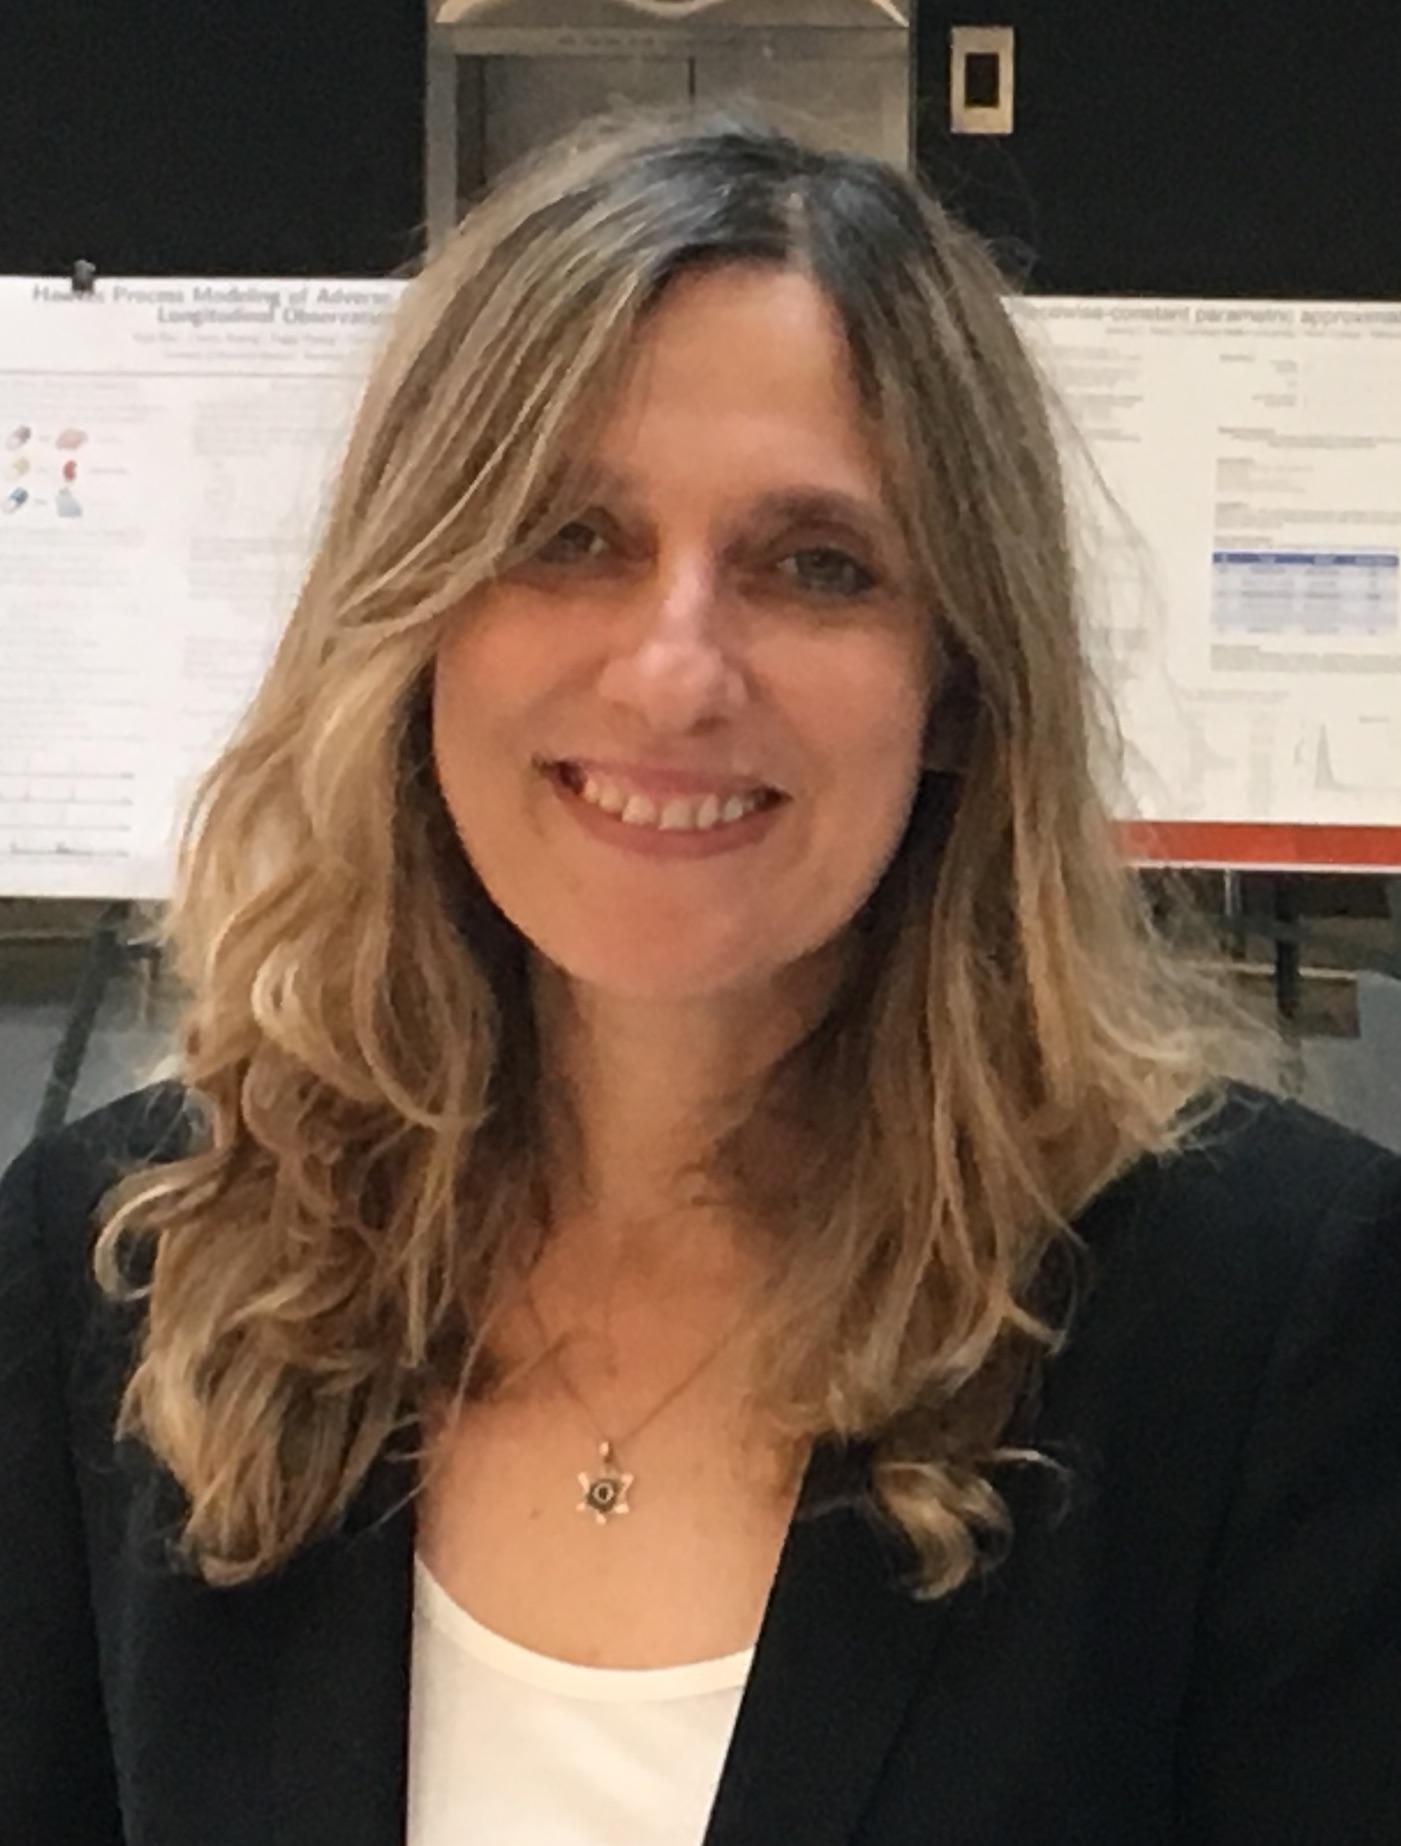 Regina Barzilay - MIT Professor, MacArthur Fellow